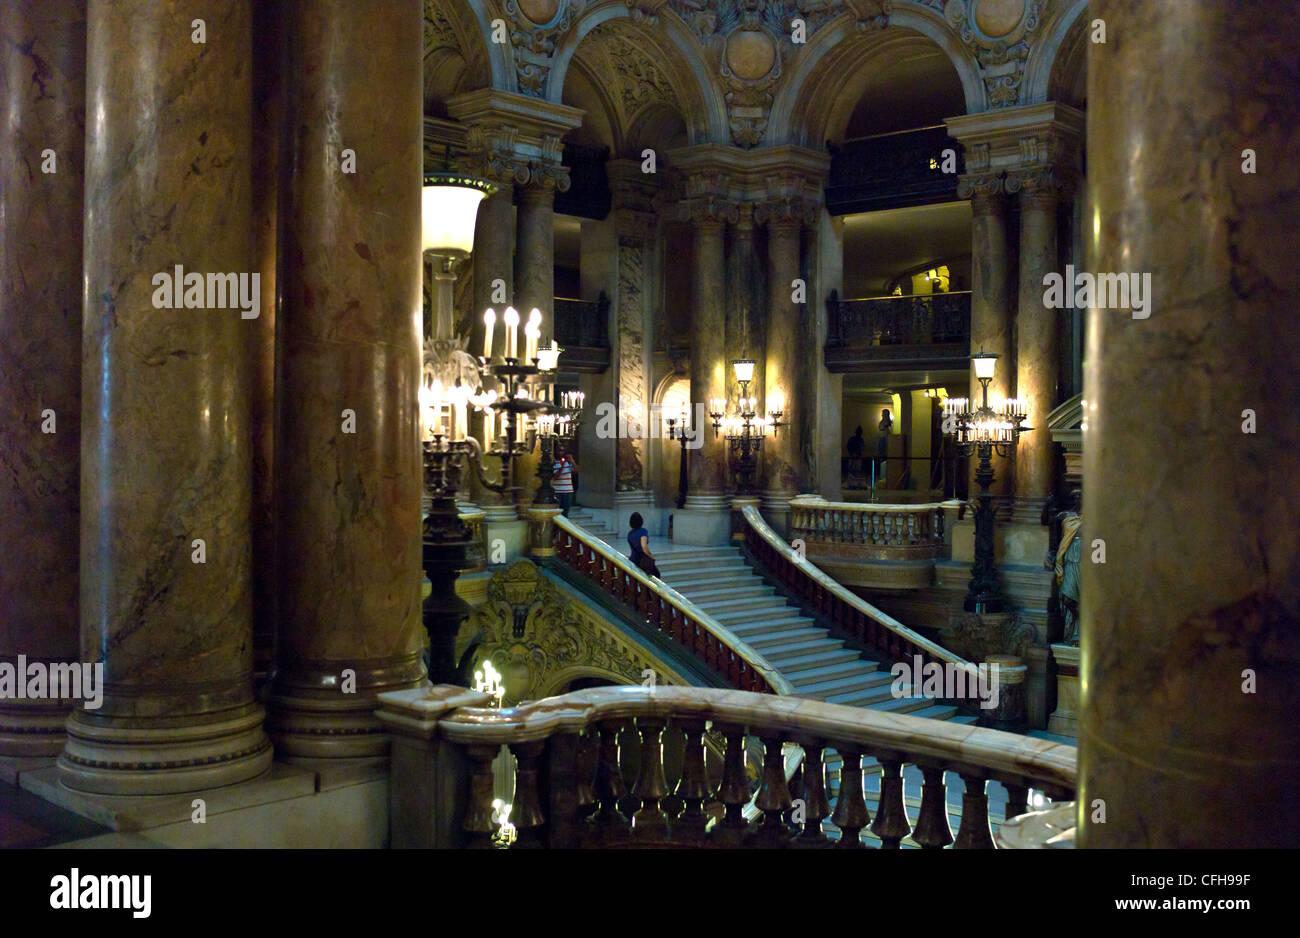 rance, Paris, the foyer of the Opéra Palais Garnier - Stock Image